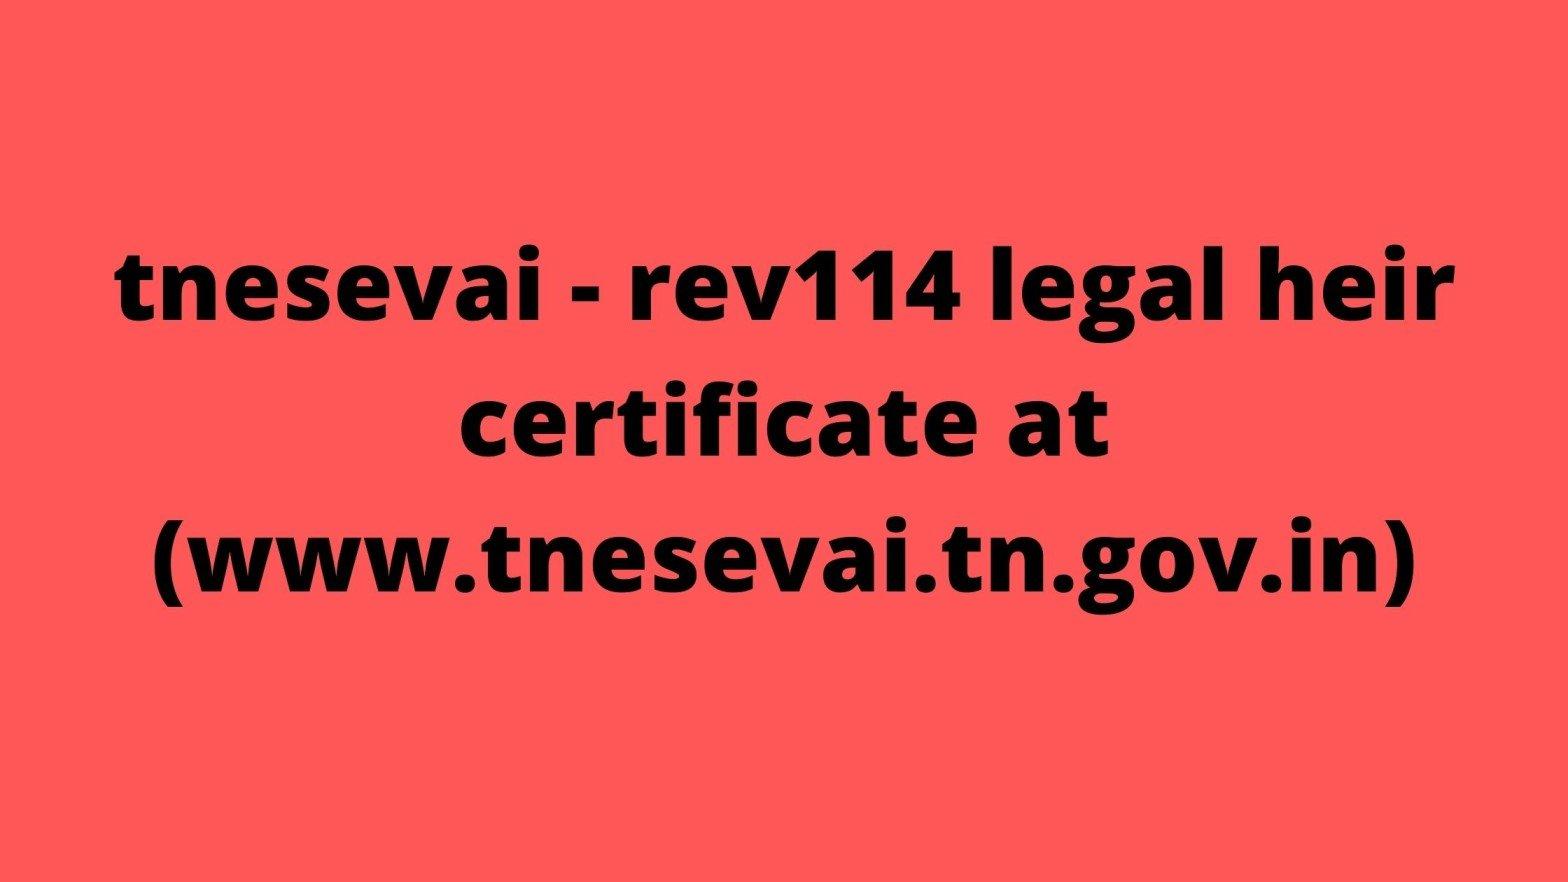 tnesevai - rev114 legal heir certificate at (www.tnesevai.tn.gov.in)